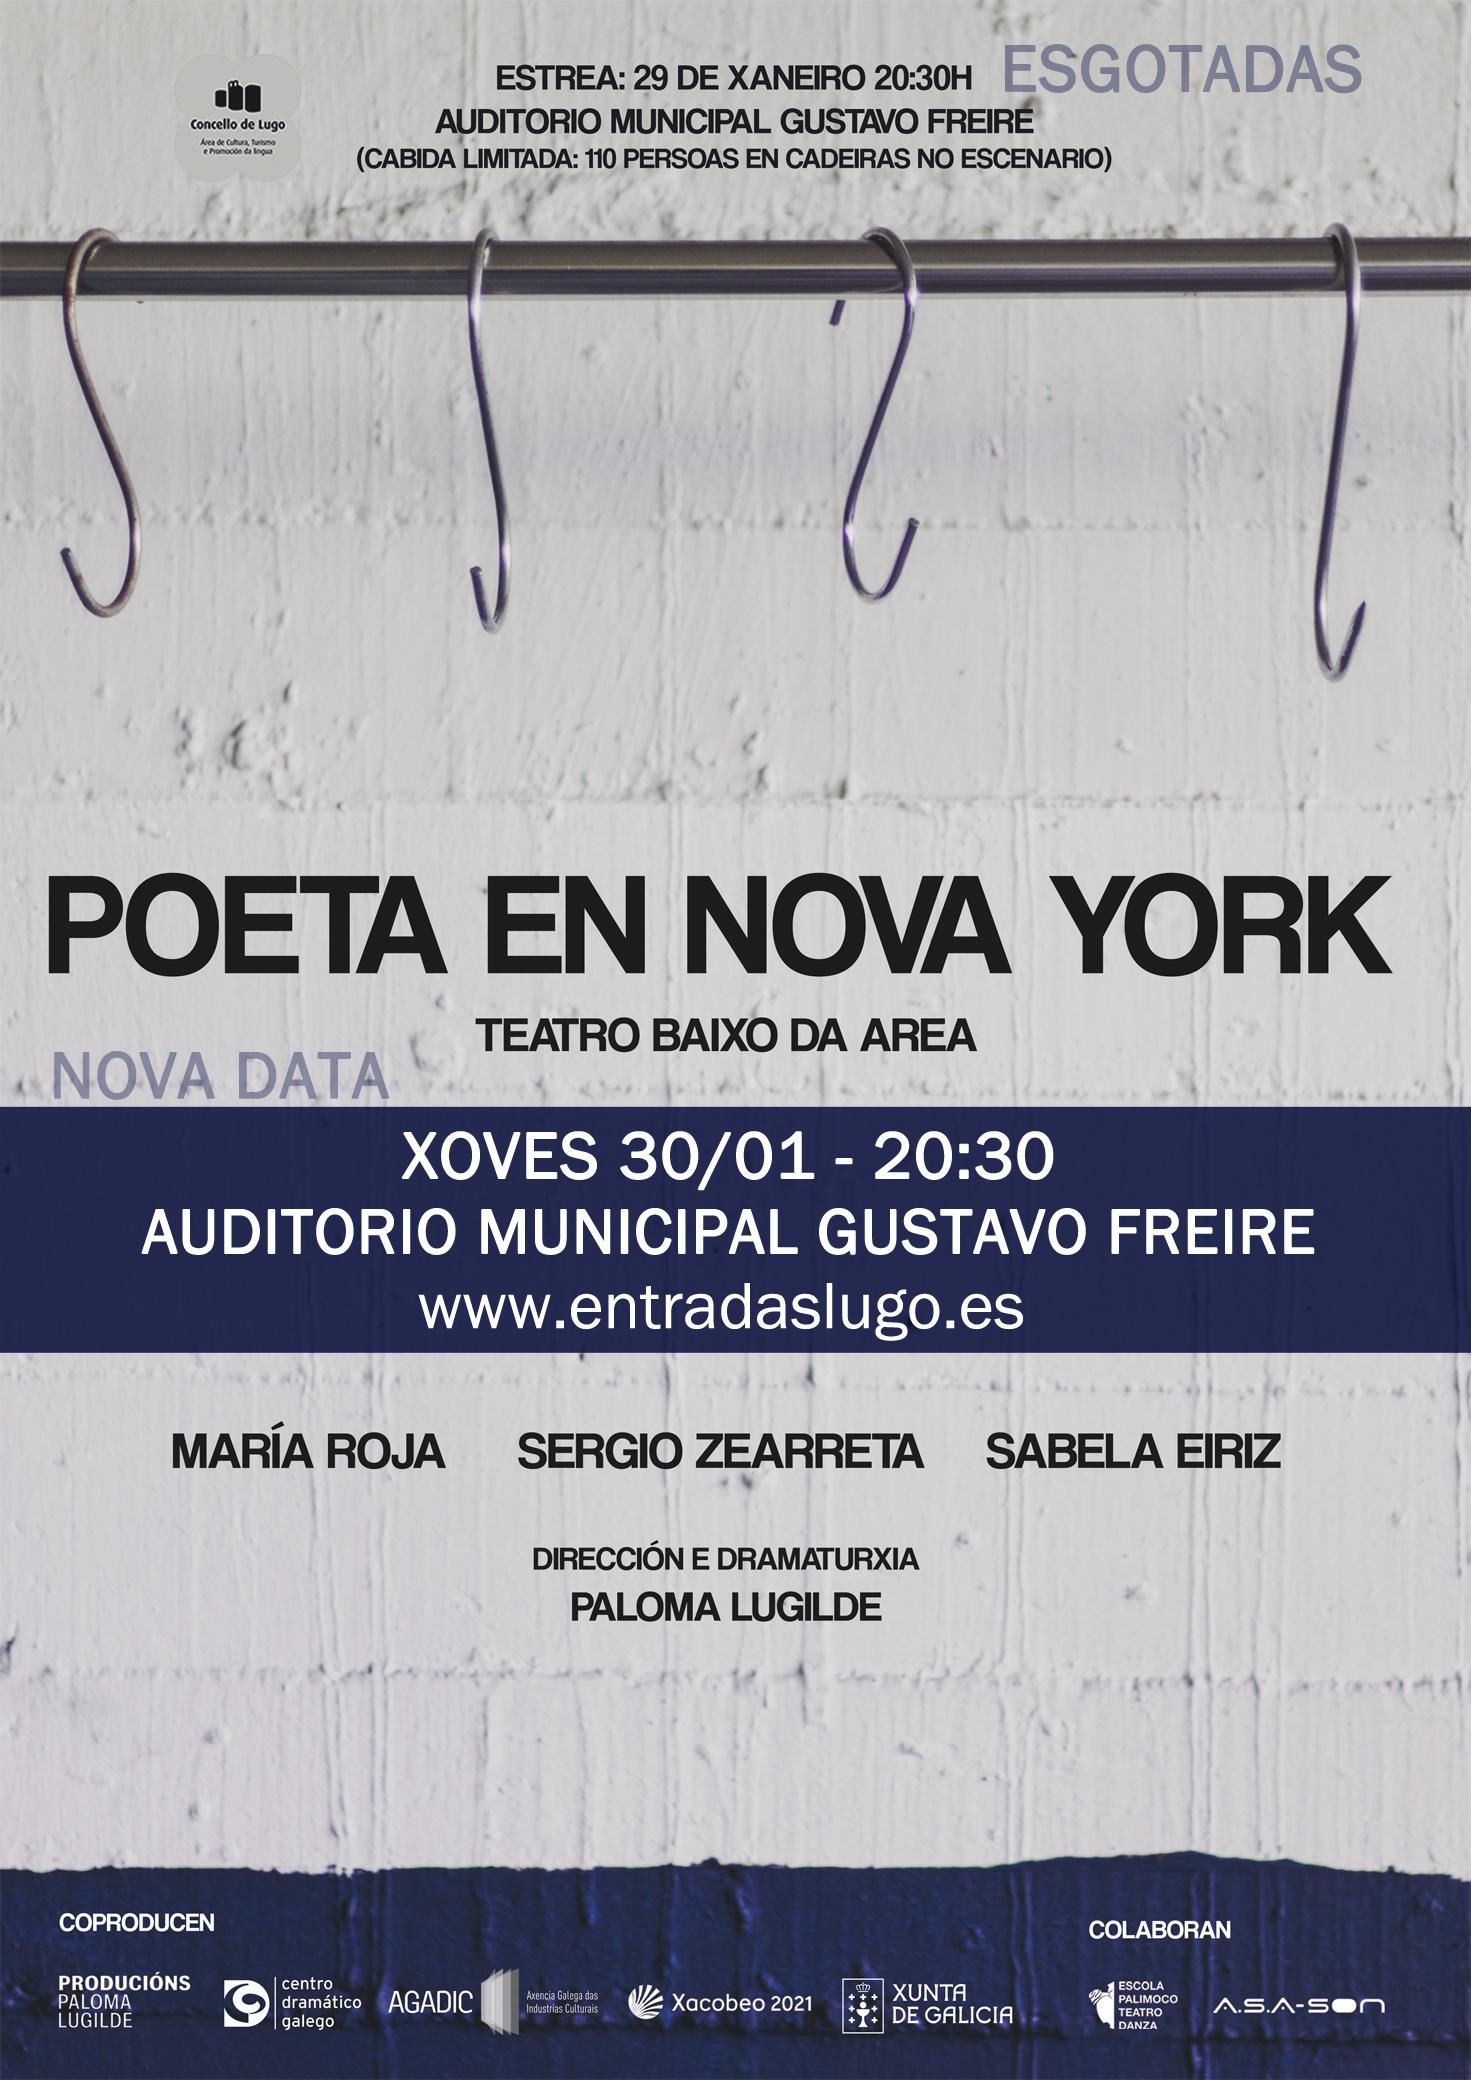 Cartel de Teatro: Poeta en Nova York no Auditorio Gustavo Freire